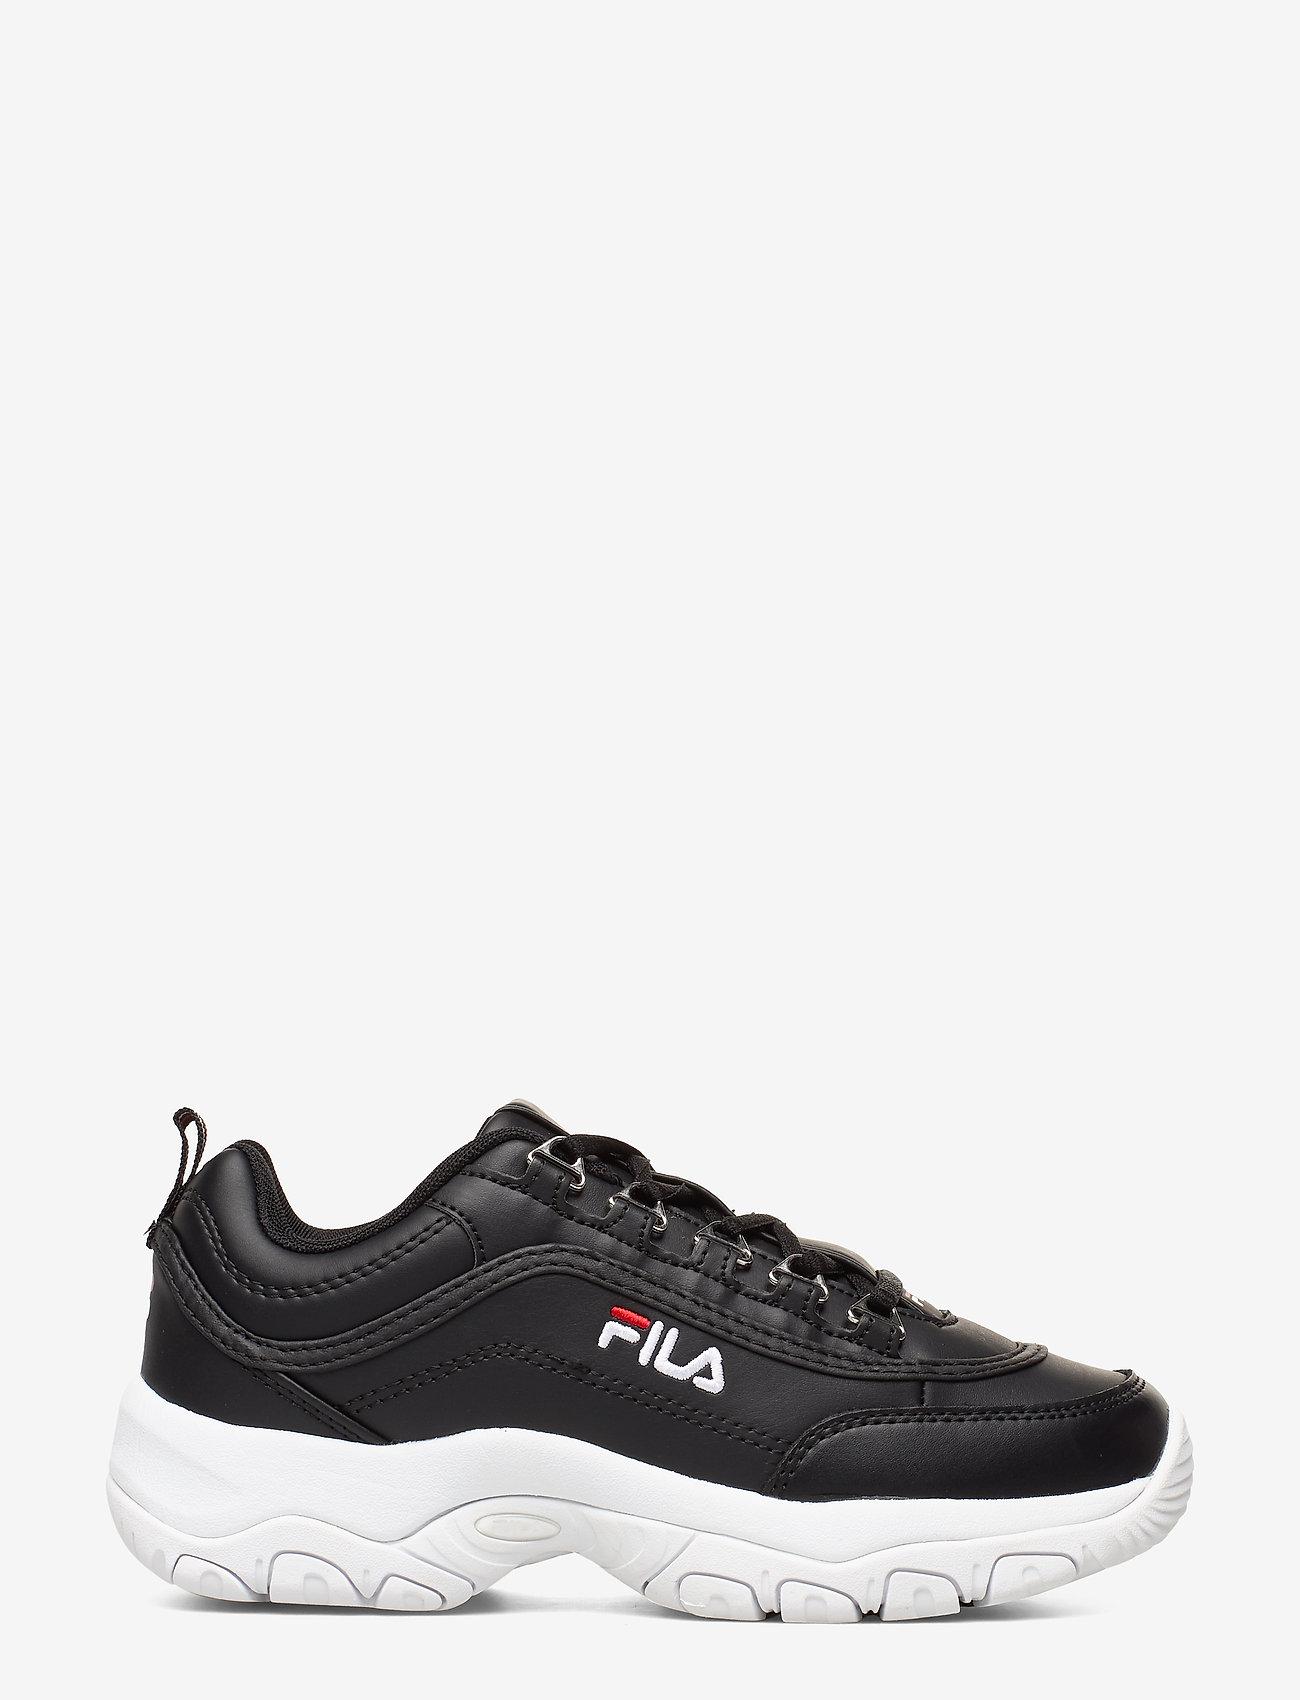 FILA - Strada low wmn - baskets épaisses - black - 1